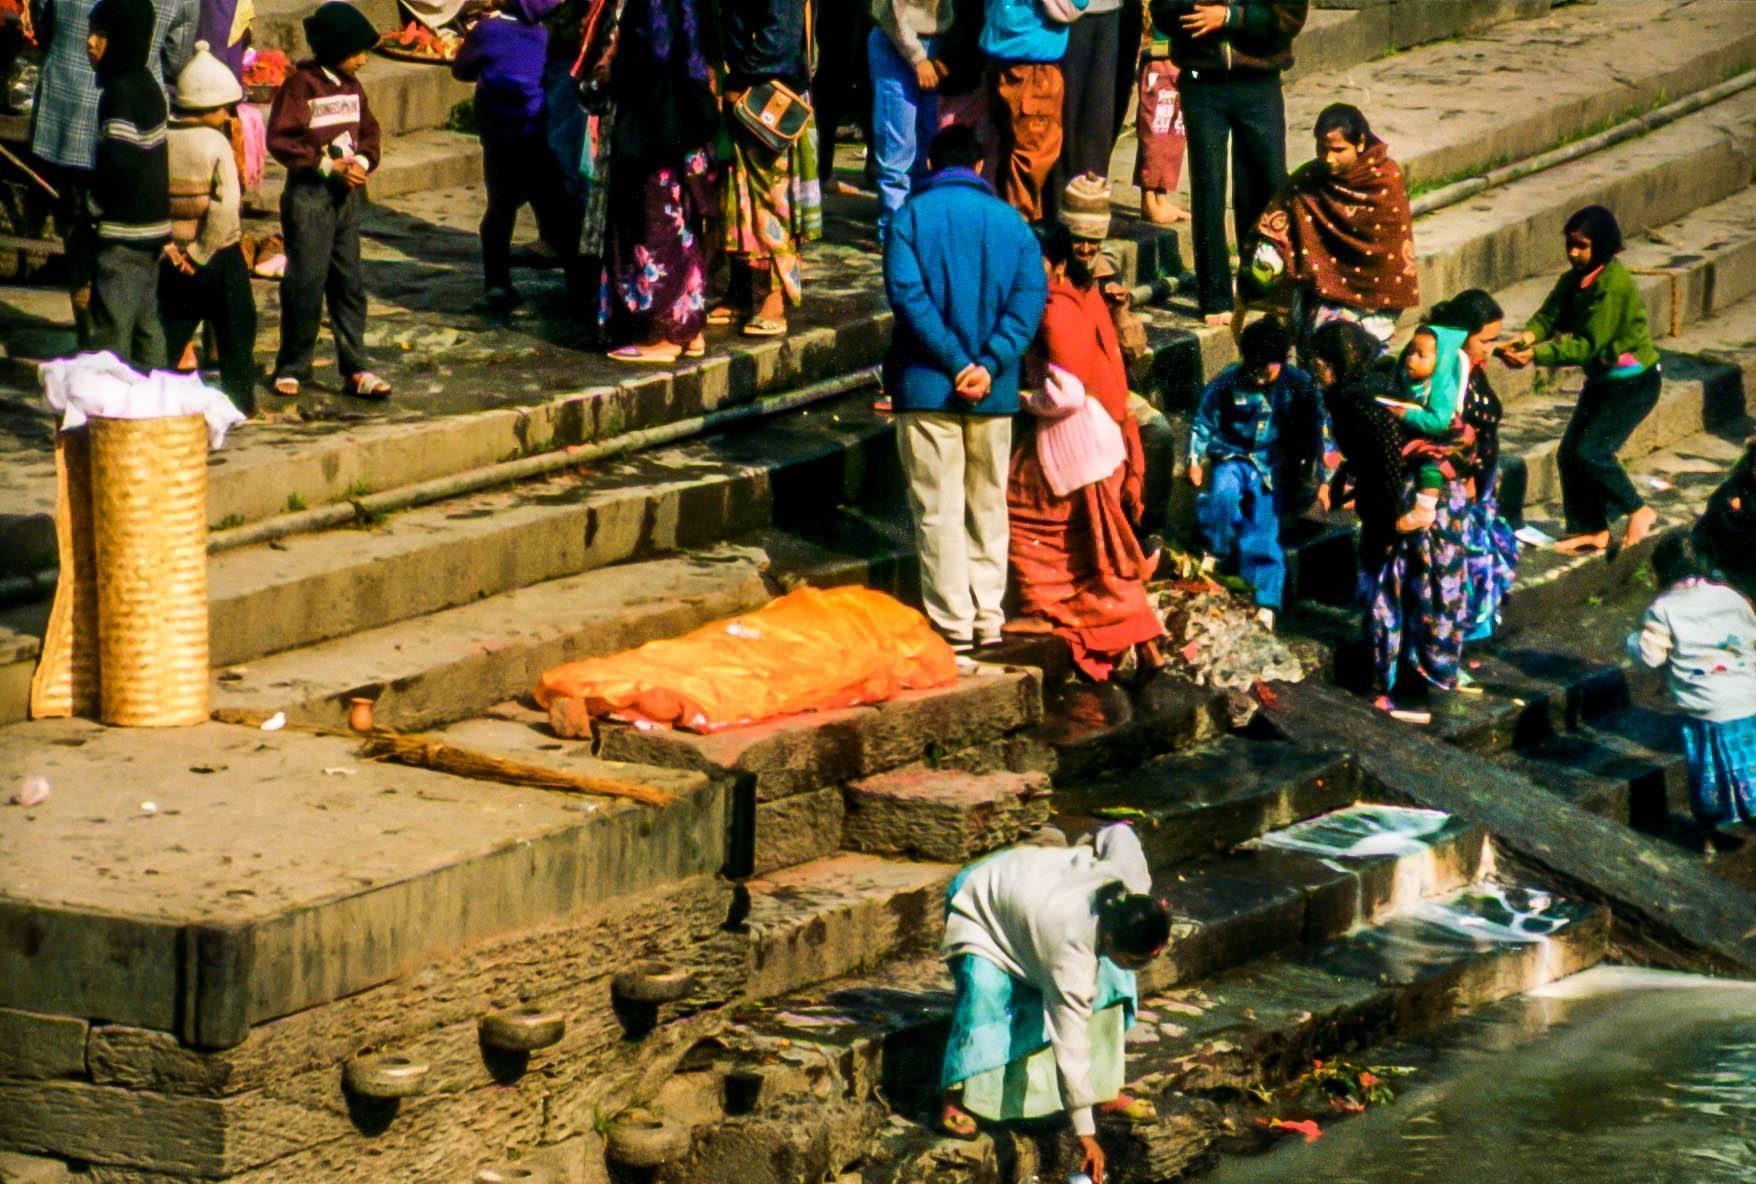 Cremation ceremony at the Bagmati River in Kathmandu, Nepal